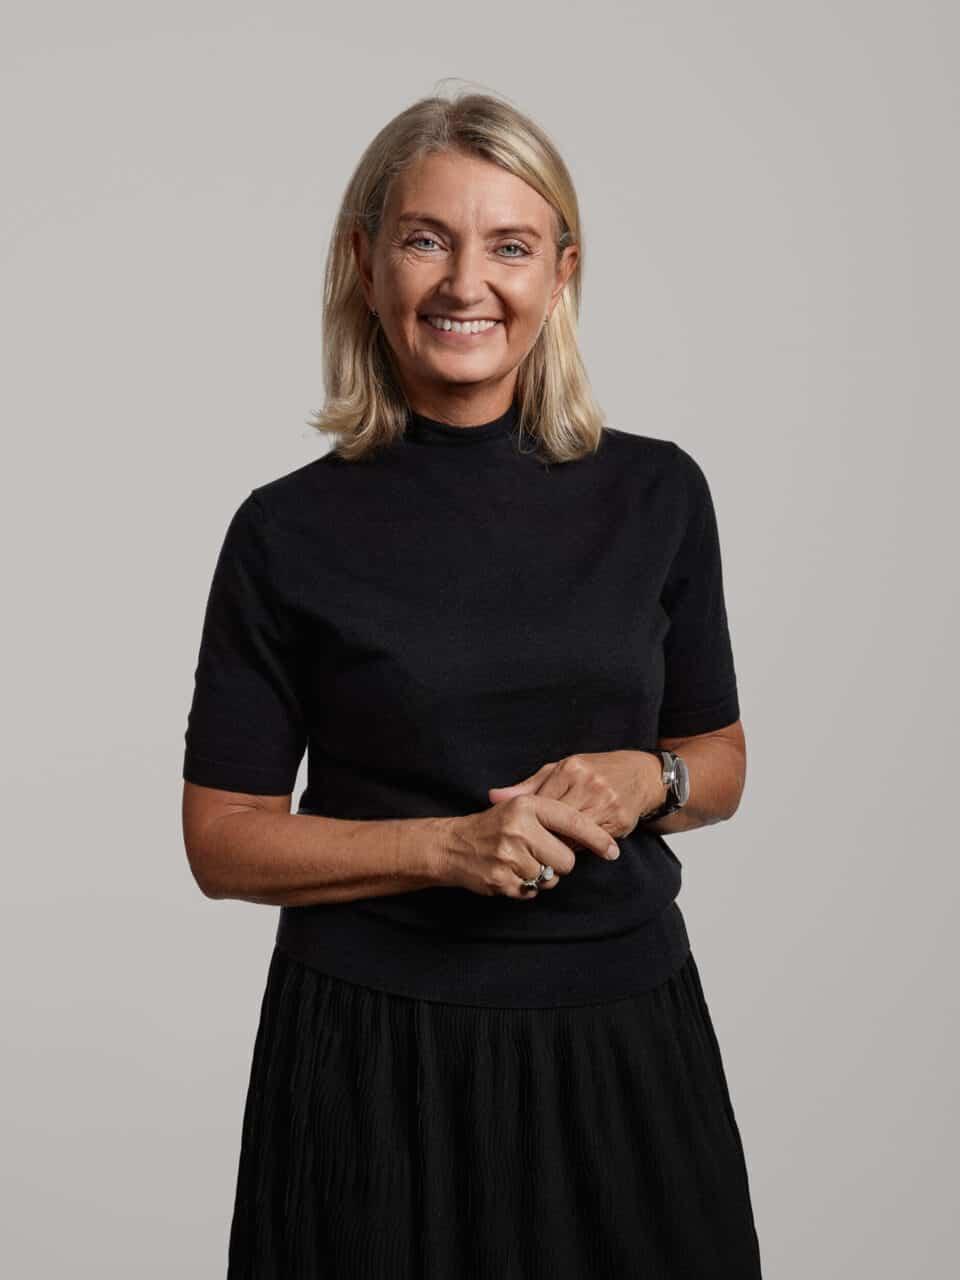 Henriette Kistrup